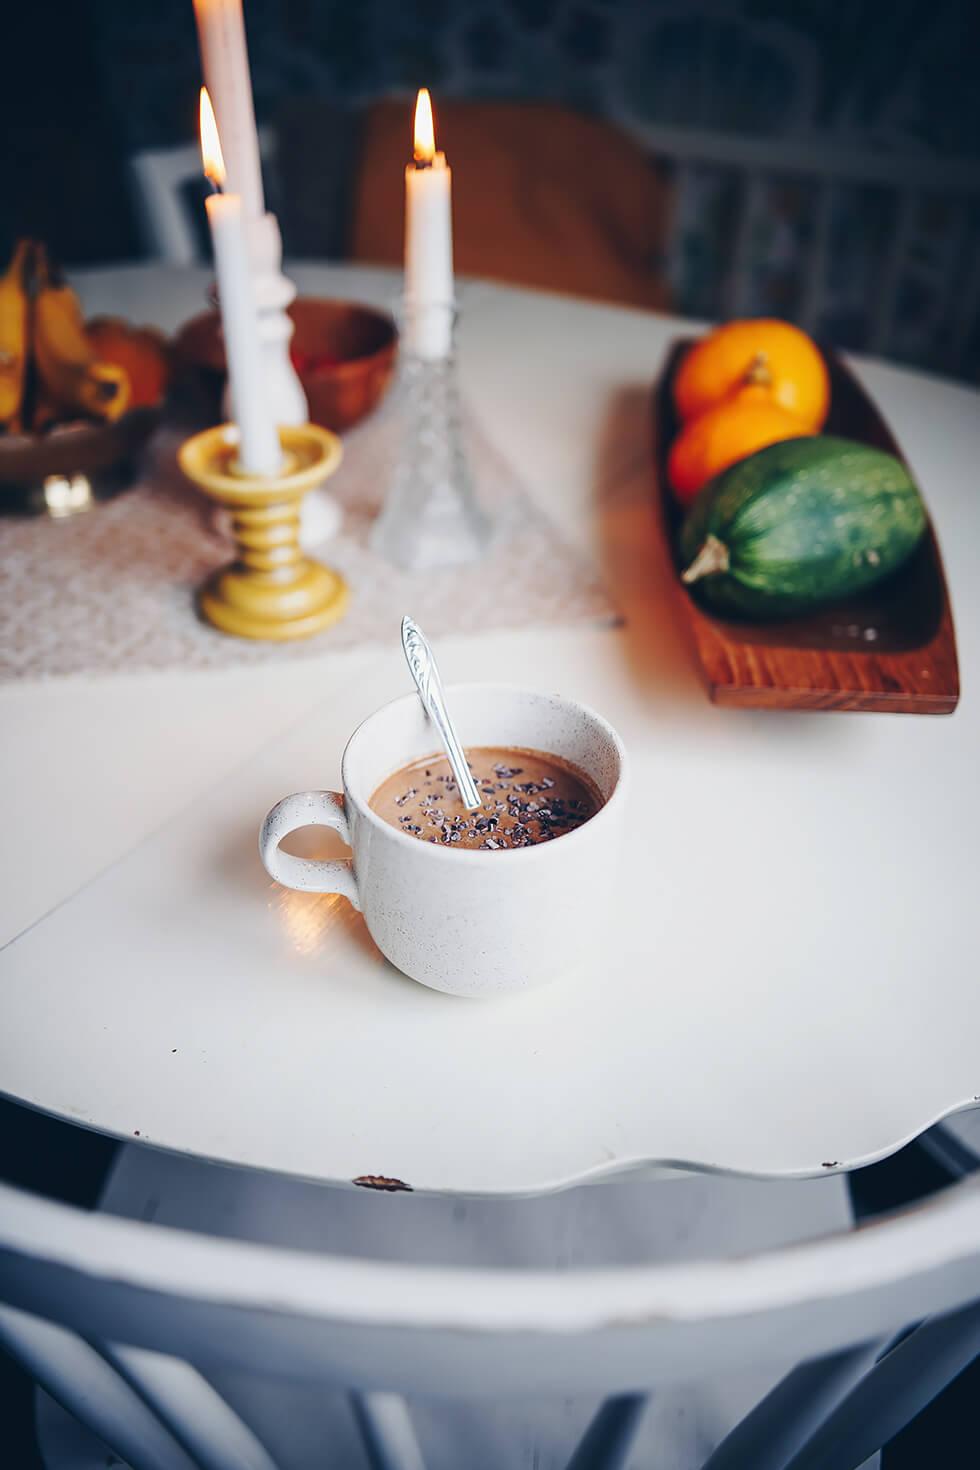 Mättande hälsosam chokladsmoothie